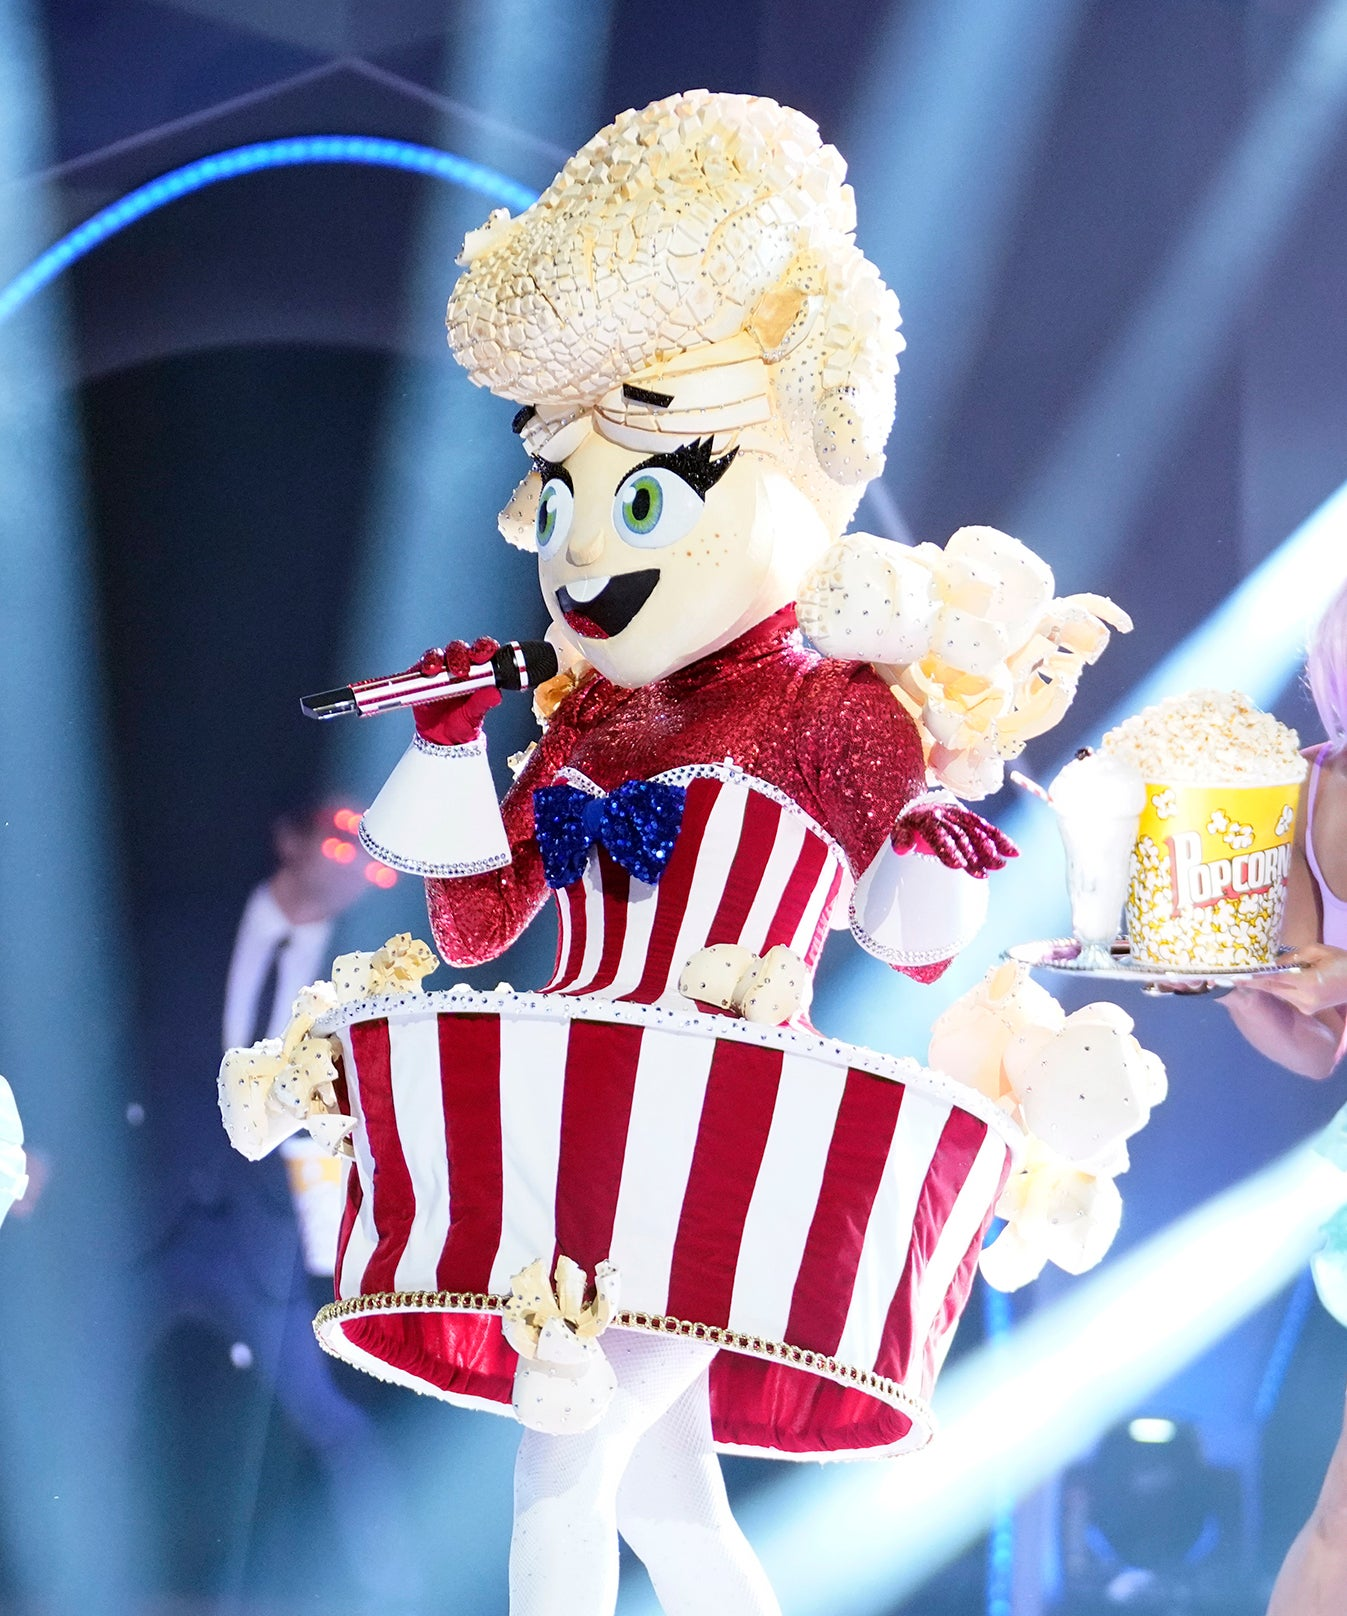 Who Is Popcorn On The Masked Singer Taylor Dayne